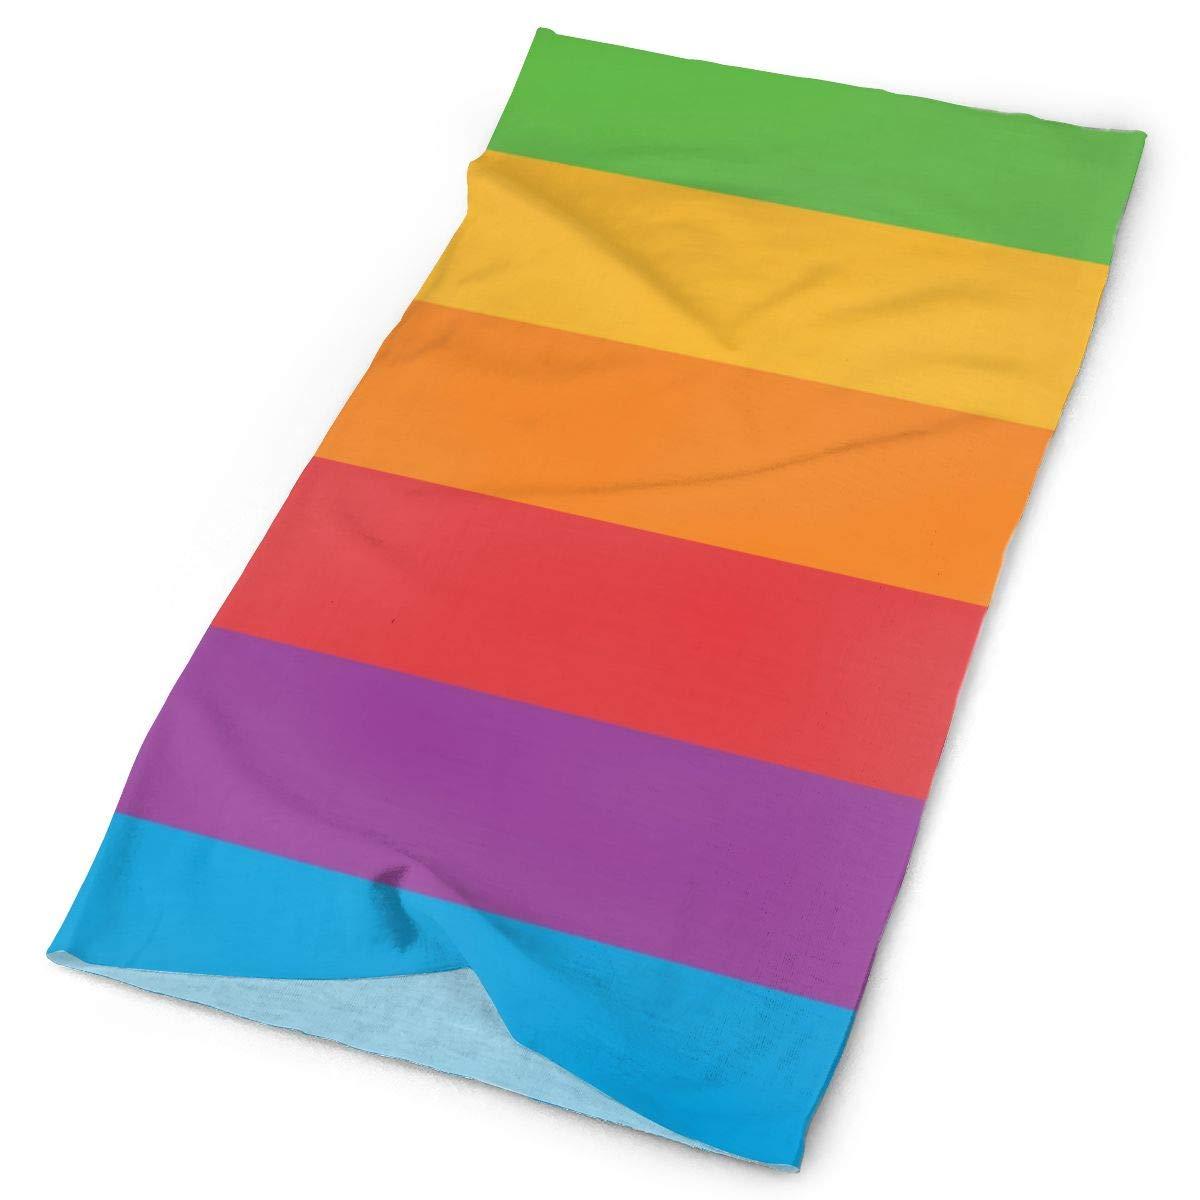 Bufanda mágica sombreros Gay Orgullo LGBT paleta de Color vincha Bandana tapa de tubo máscara Neck Gaiter Headwrap pasamontañas sol UV